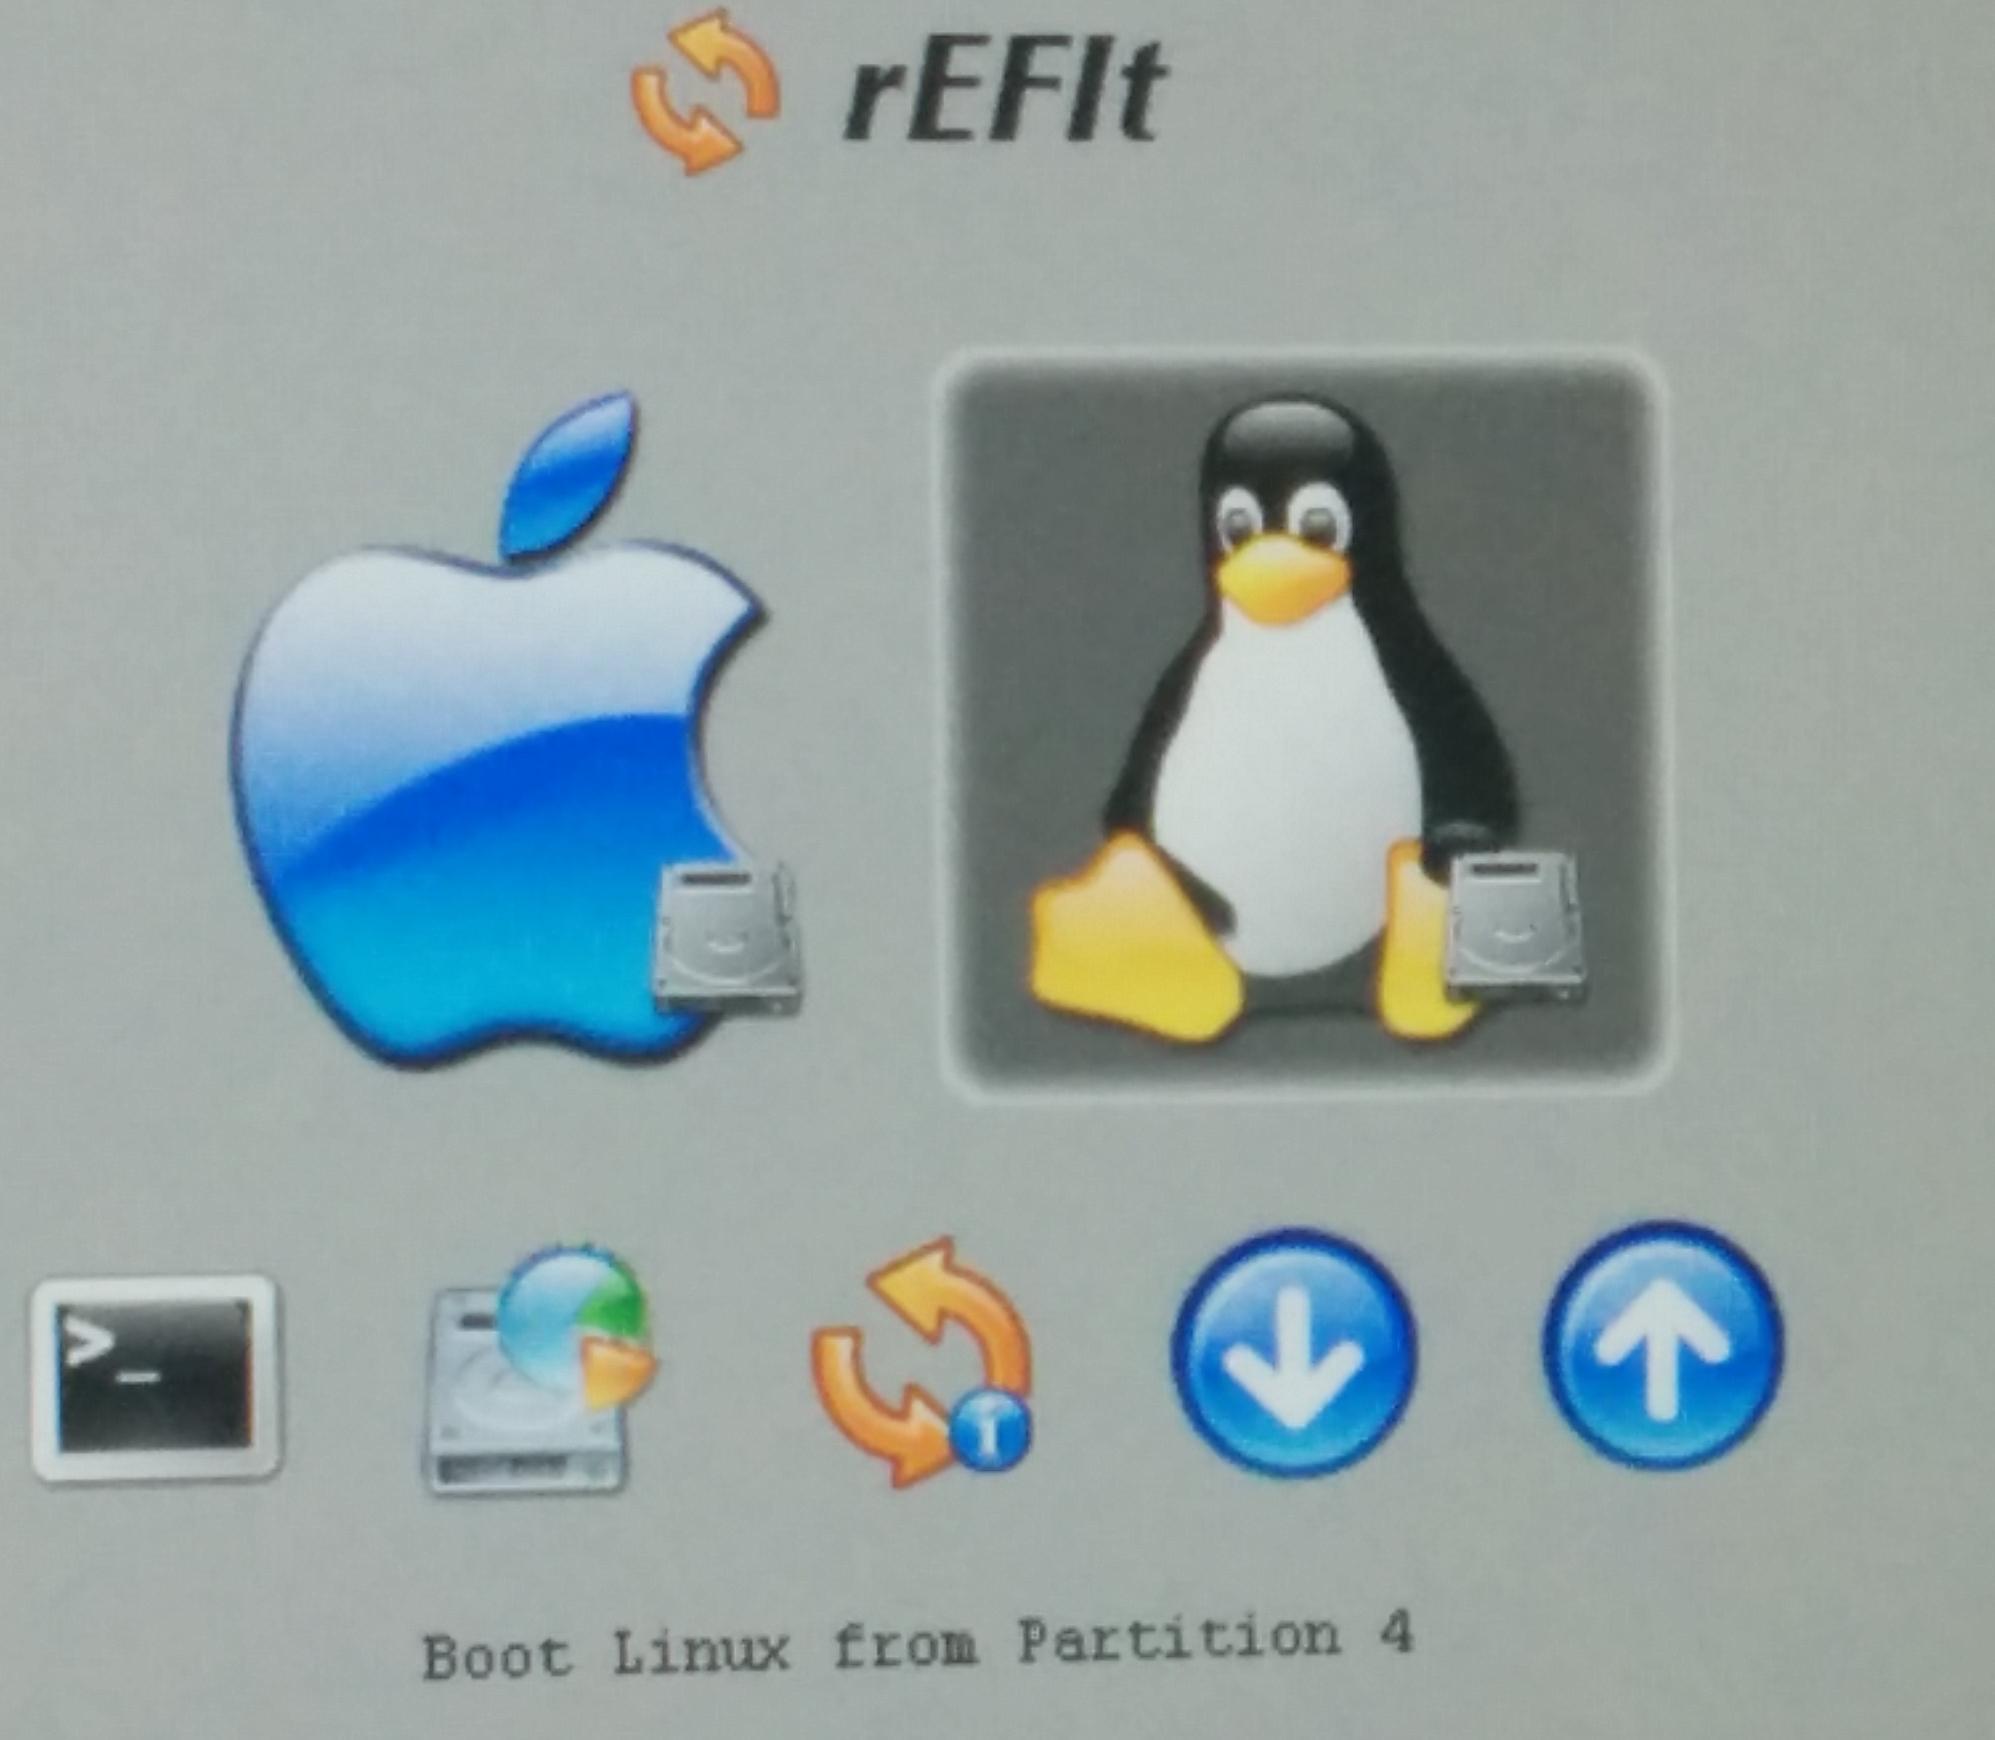 refit-linux-selected_g